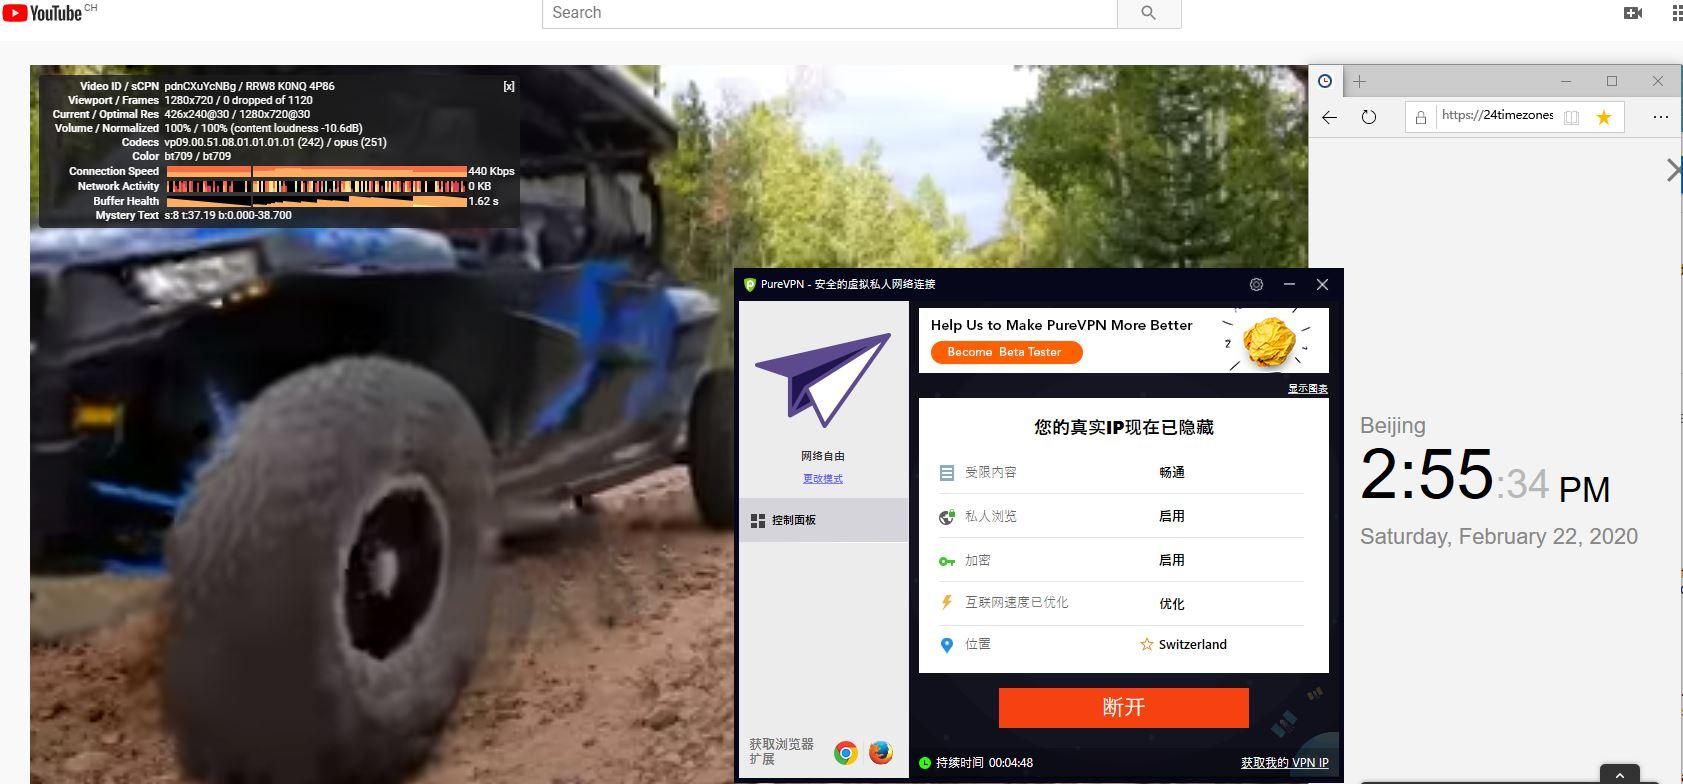 Windows10 PureVPN Switzerland 中国VPN翻墙 科学上网 SpeedTest测试 - 20200222